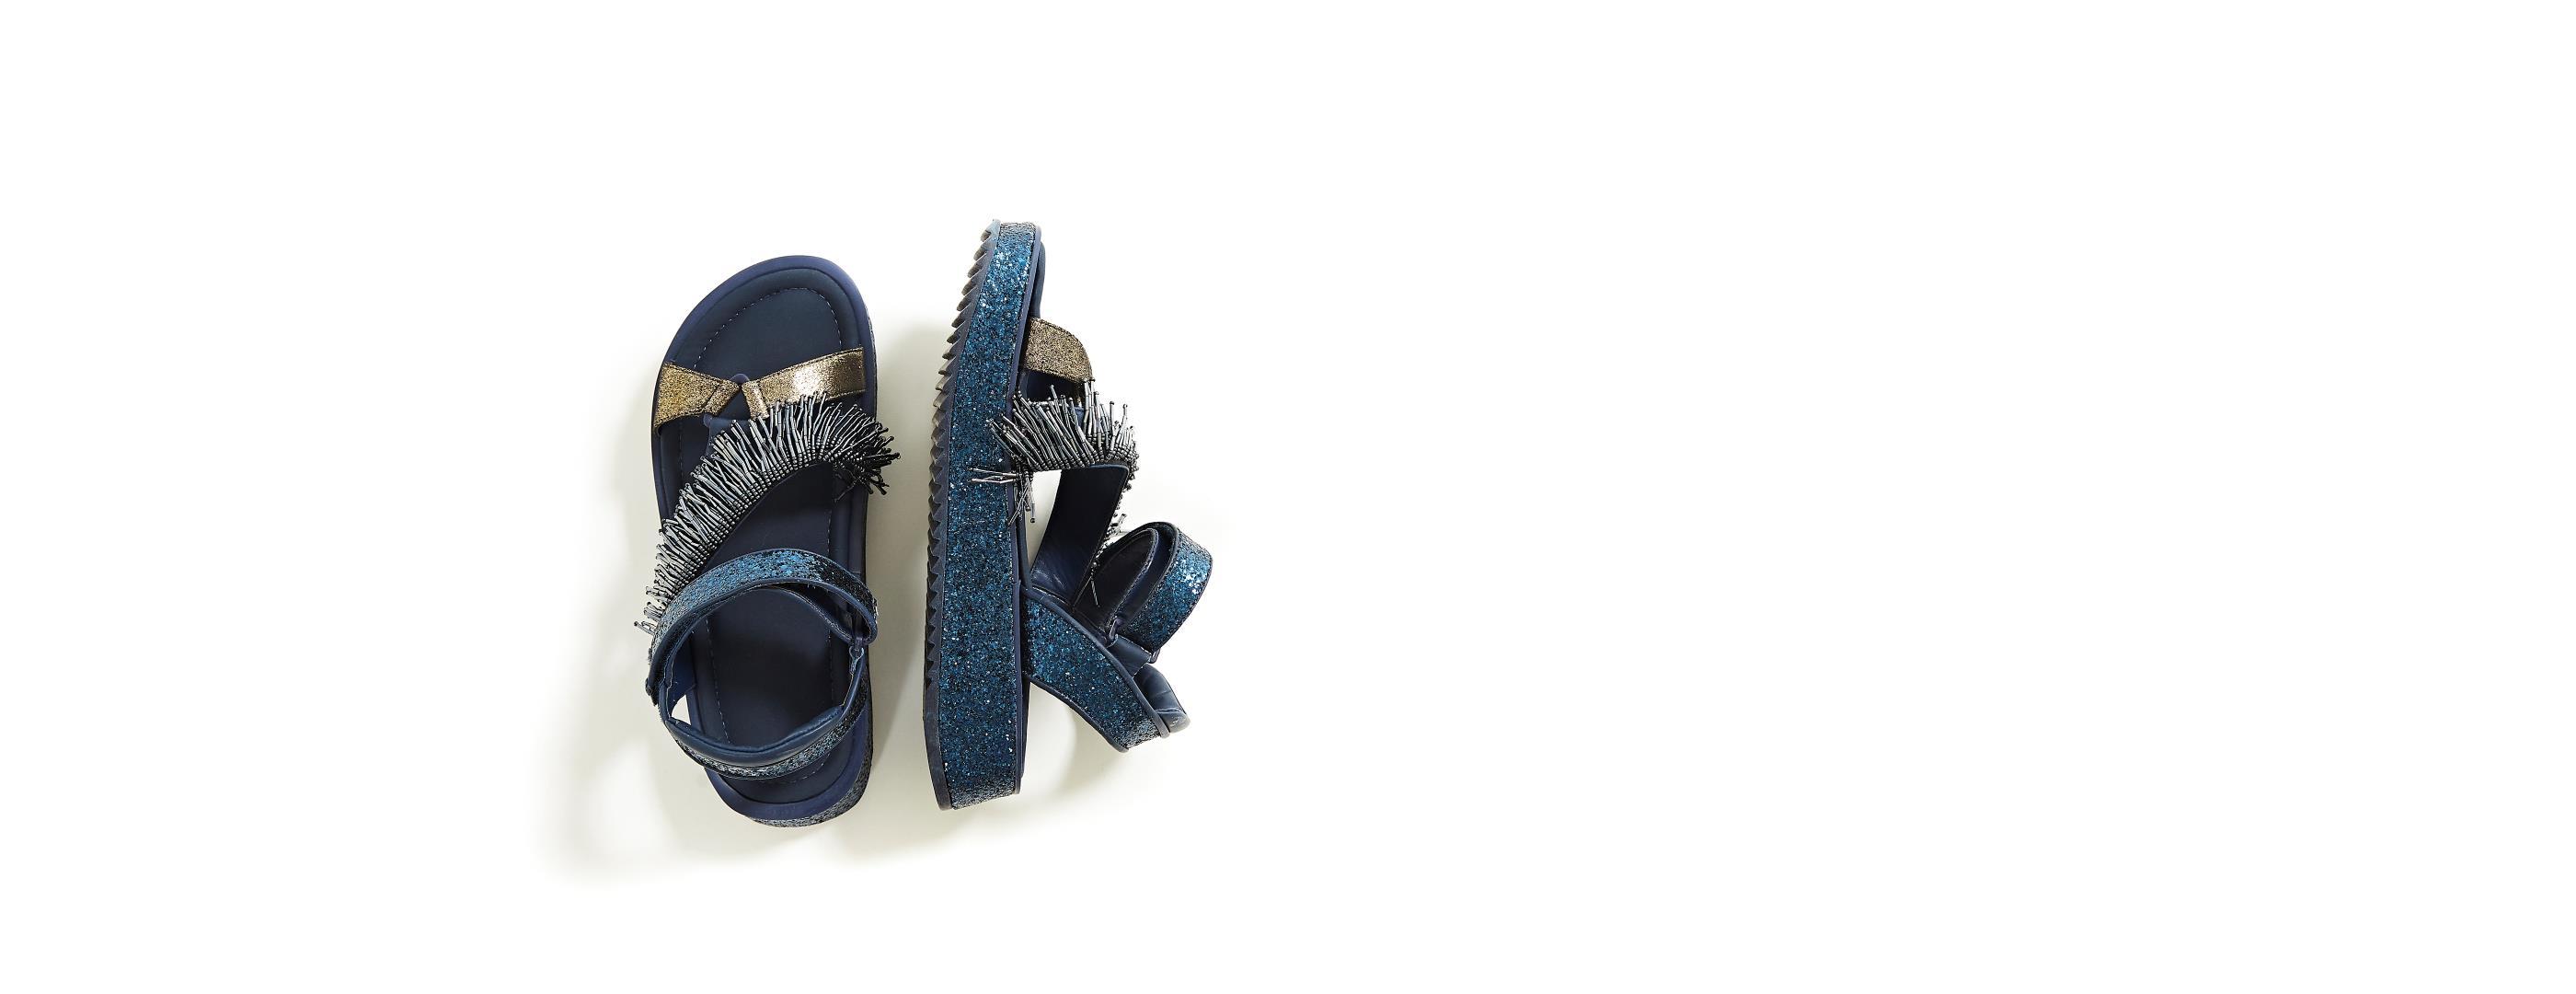 9b81dbc042 Sandalia Glitter Azul - Farm